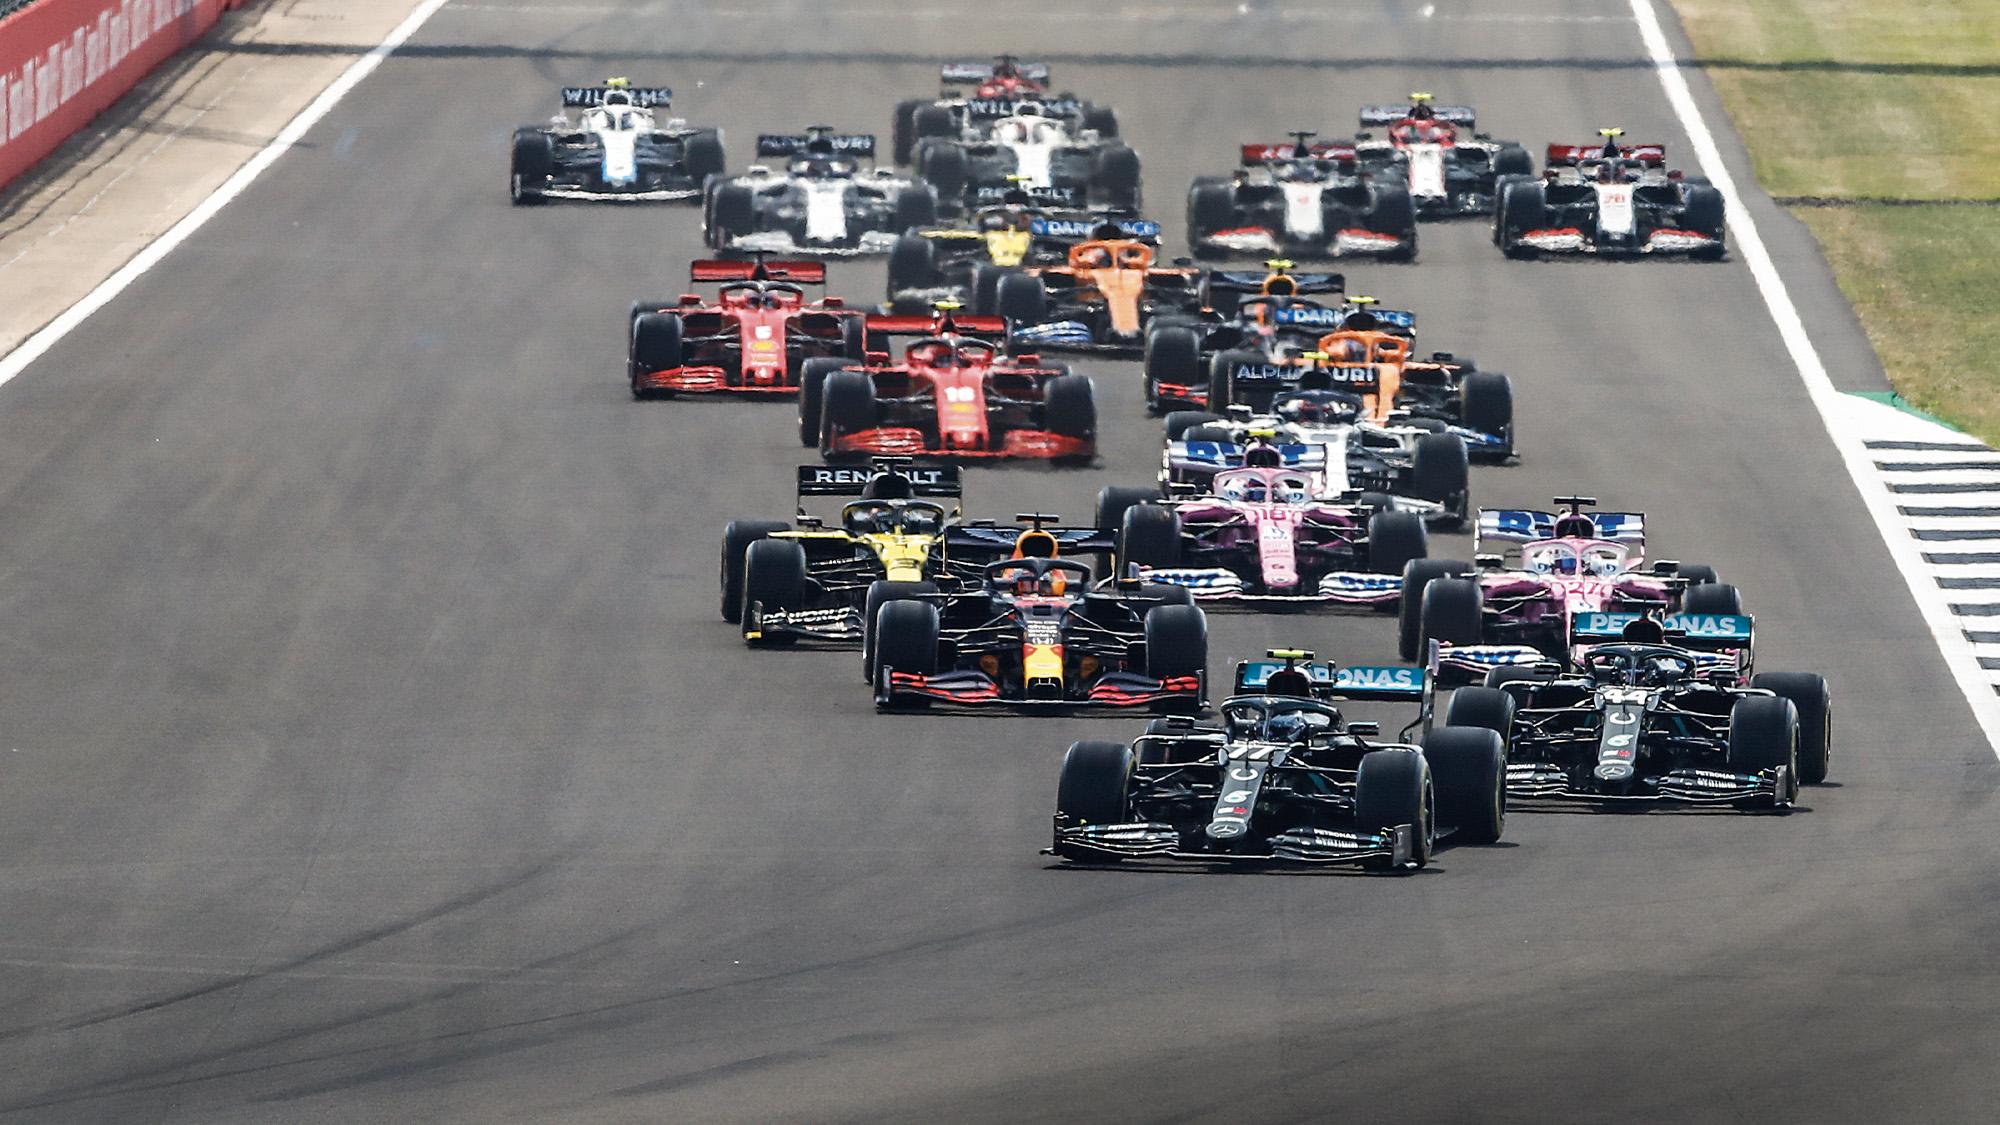 Start of the Formula 1 70th Anniversary Grand Prix at Silverstone